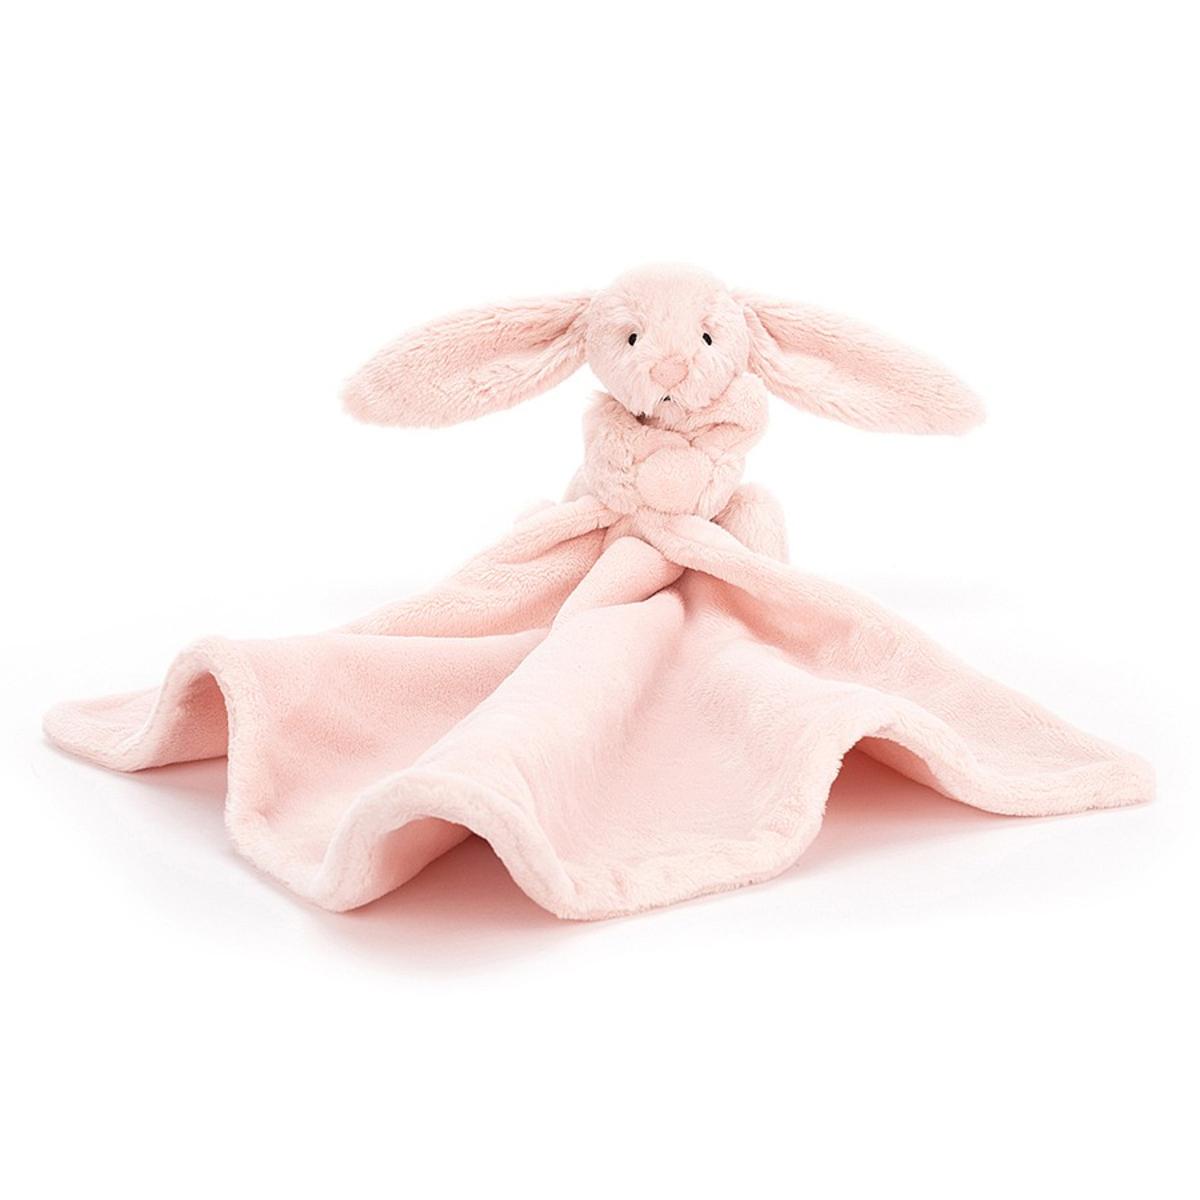 Doudou Bashful Blush Bunny Soother Bashful Blush Bunny Soother